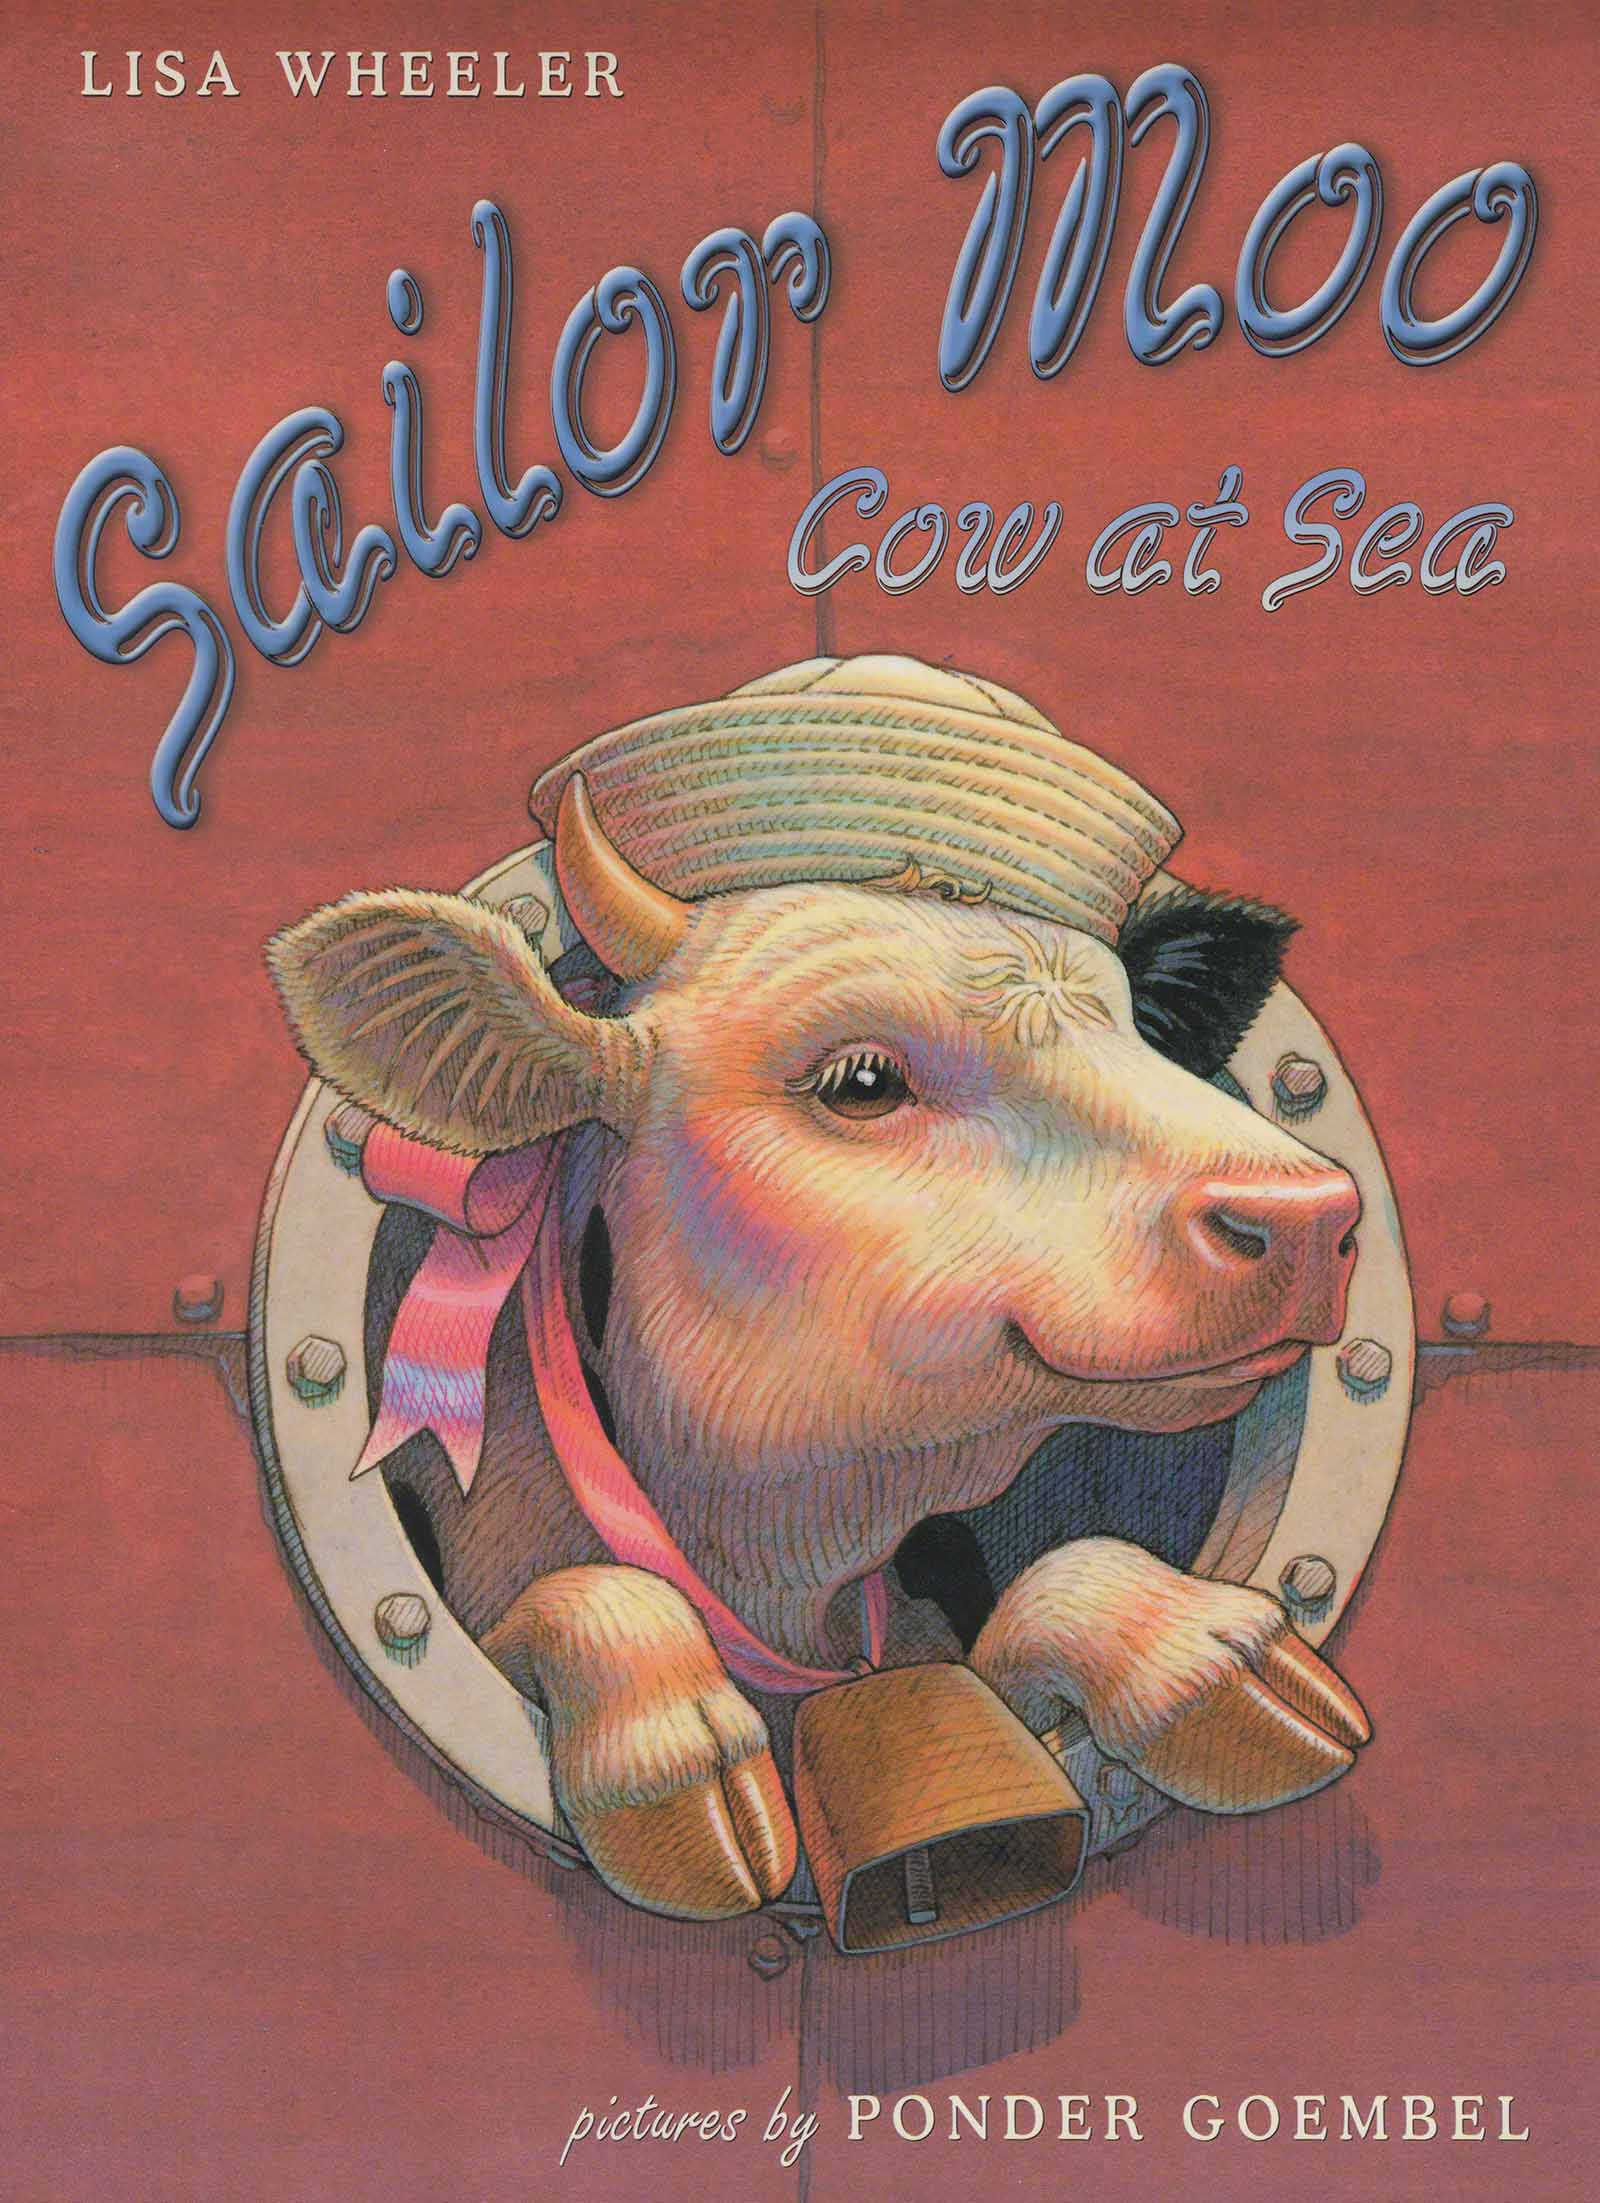 Illustrated Children S Book Covers ~ Illustrator u ponder the artist